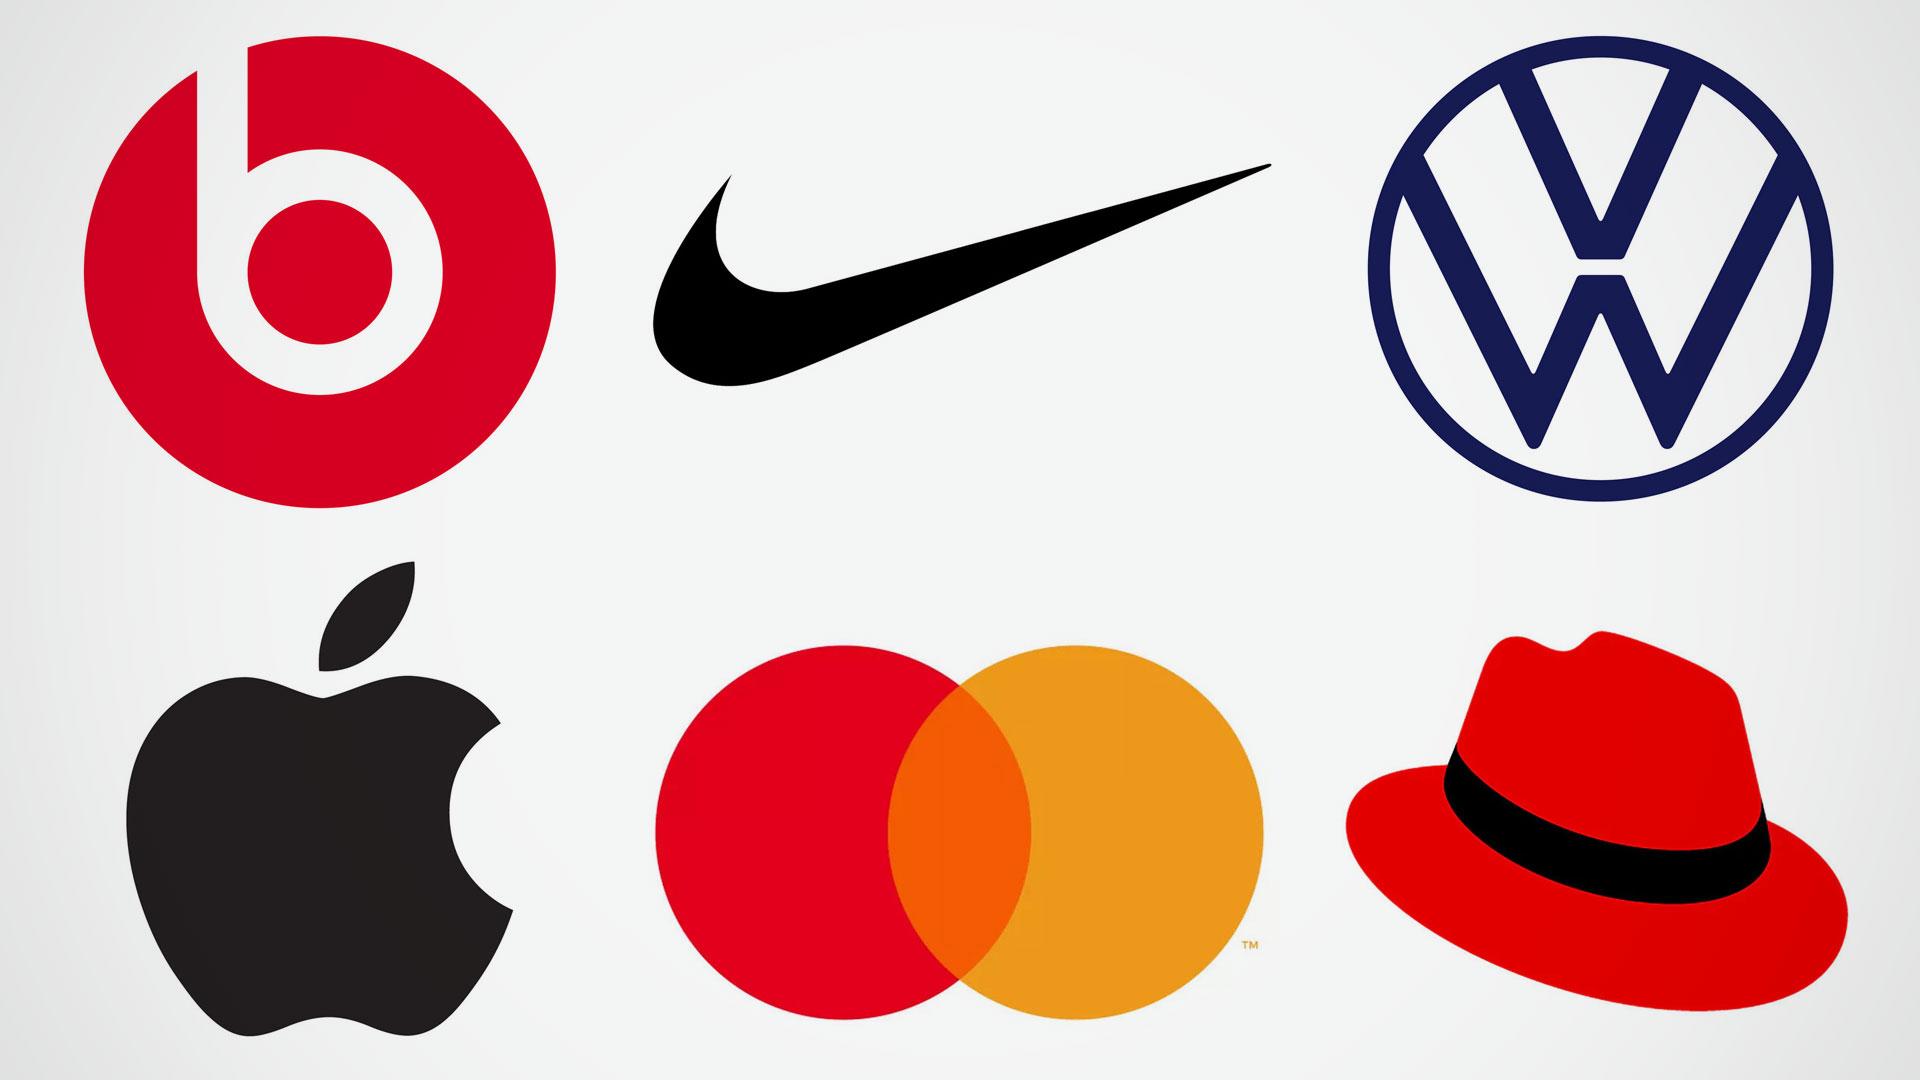 Logo design: 15 golden rules for crafting logos